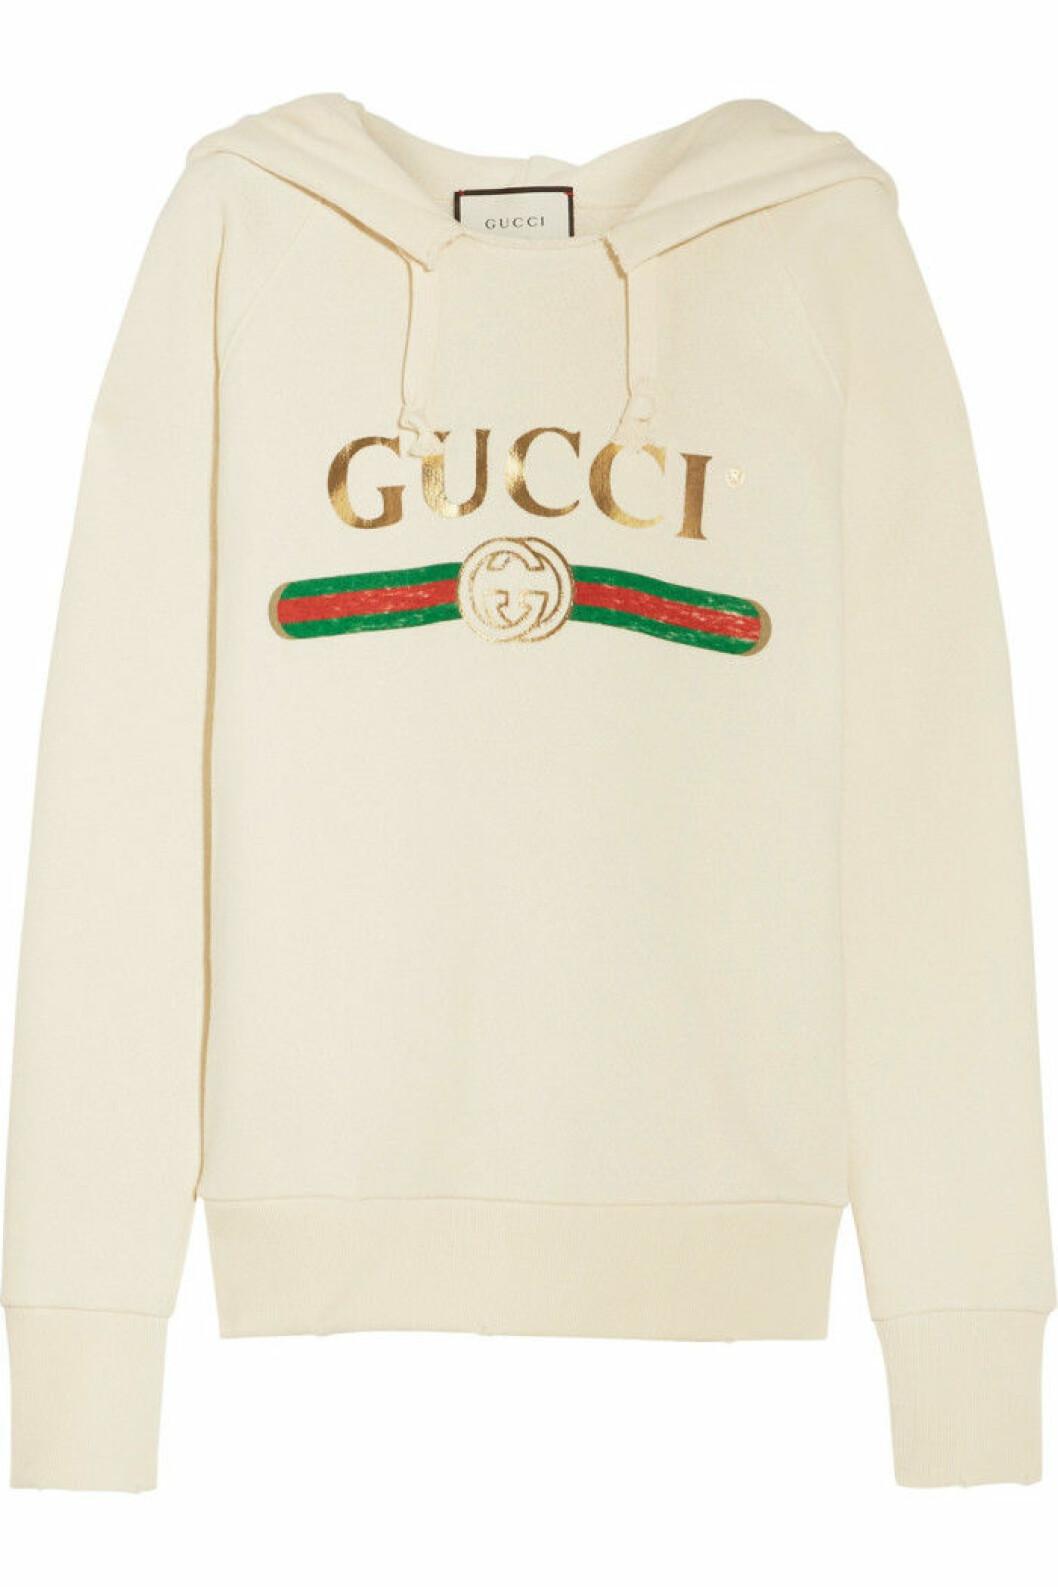 sweatshirt-gucci